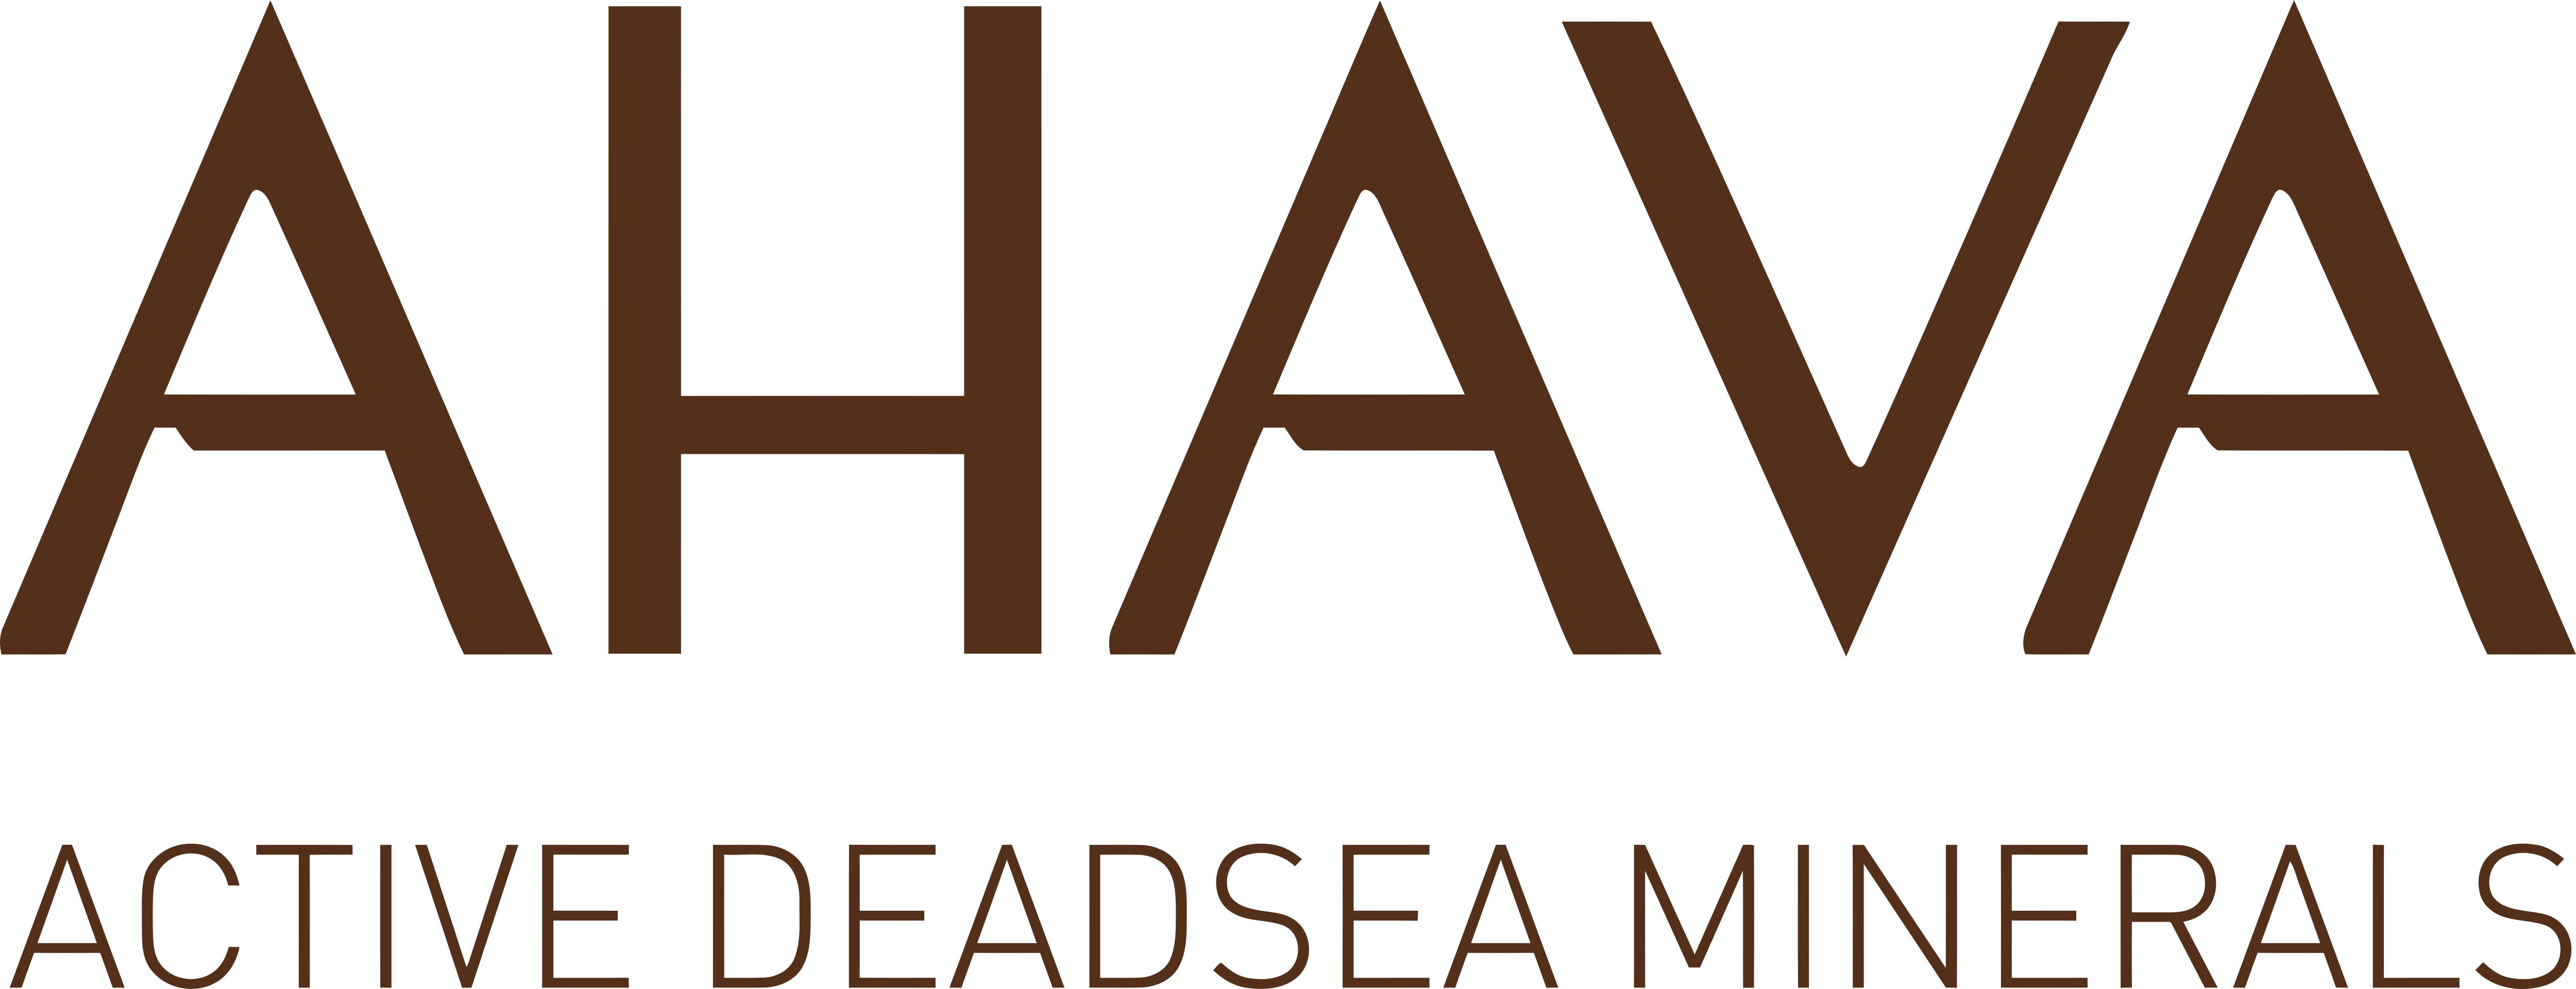 Ahava Fosun Logo Png Transparent Download Mer Morte